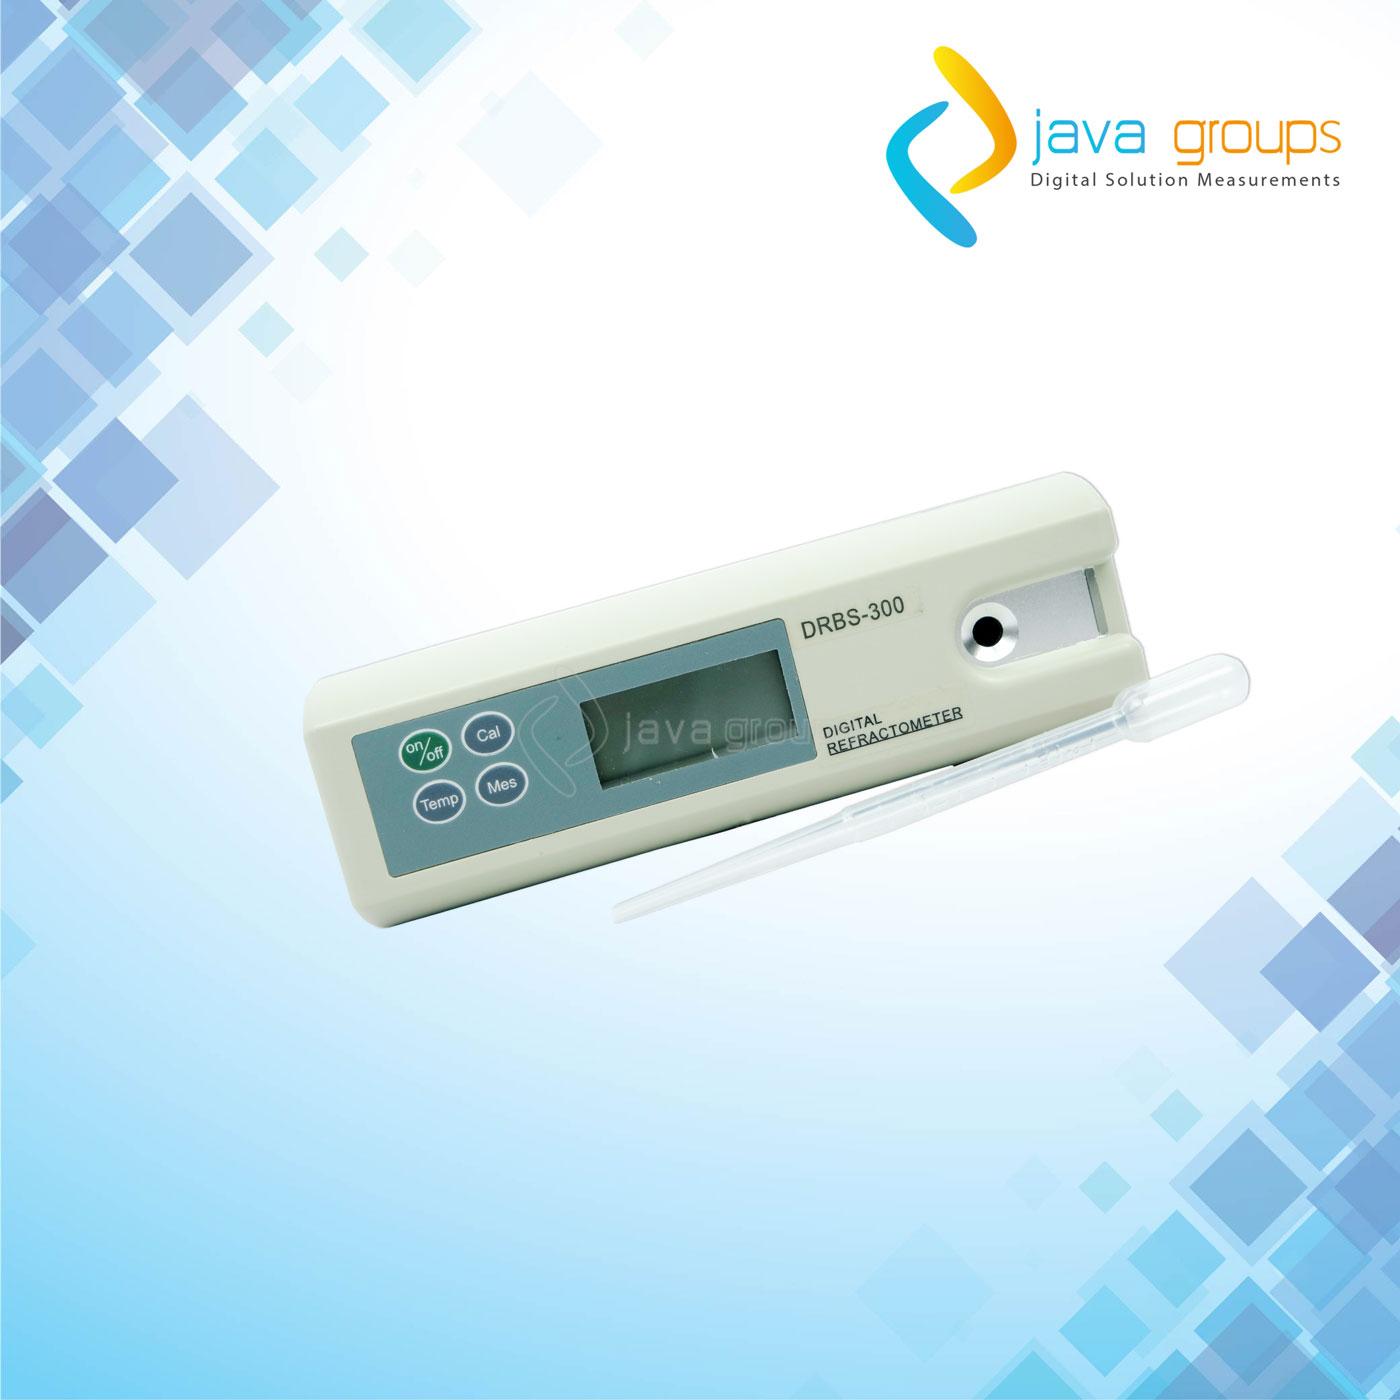 Alat Pengukur Zat Terlarut Digital Refractometer DRBS-300